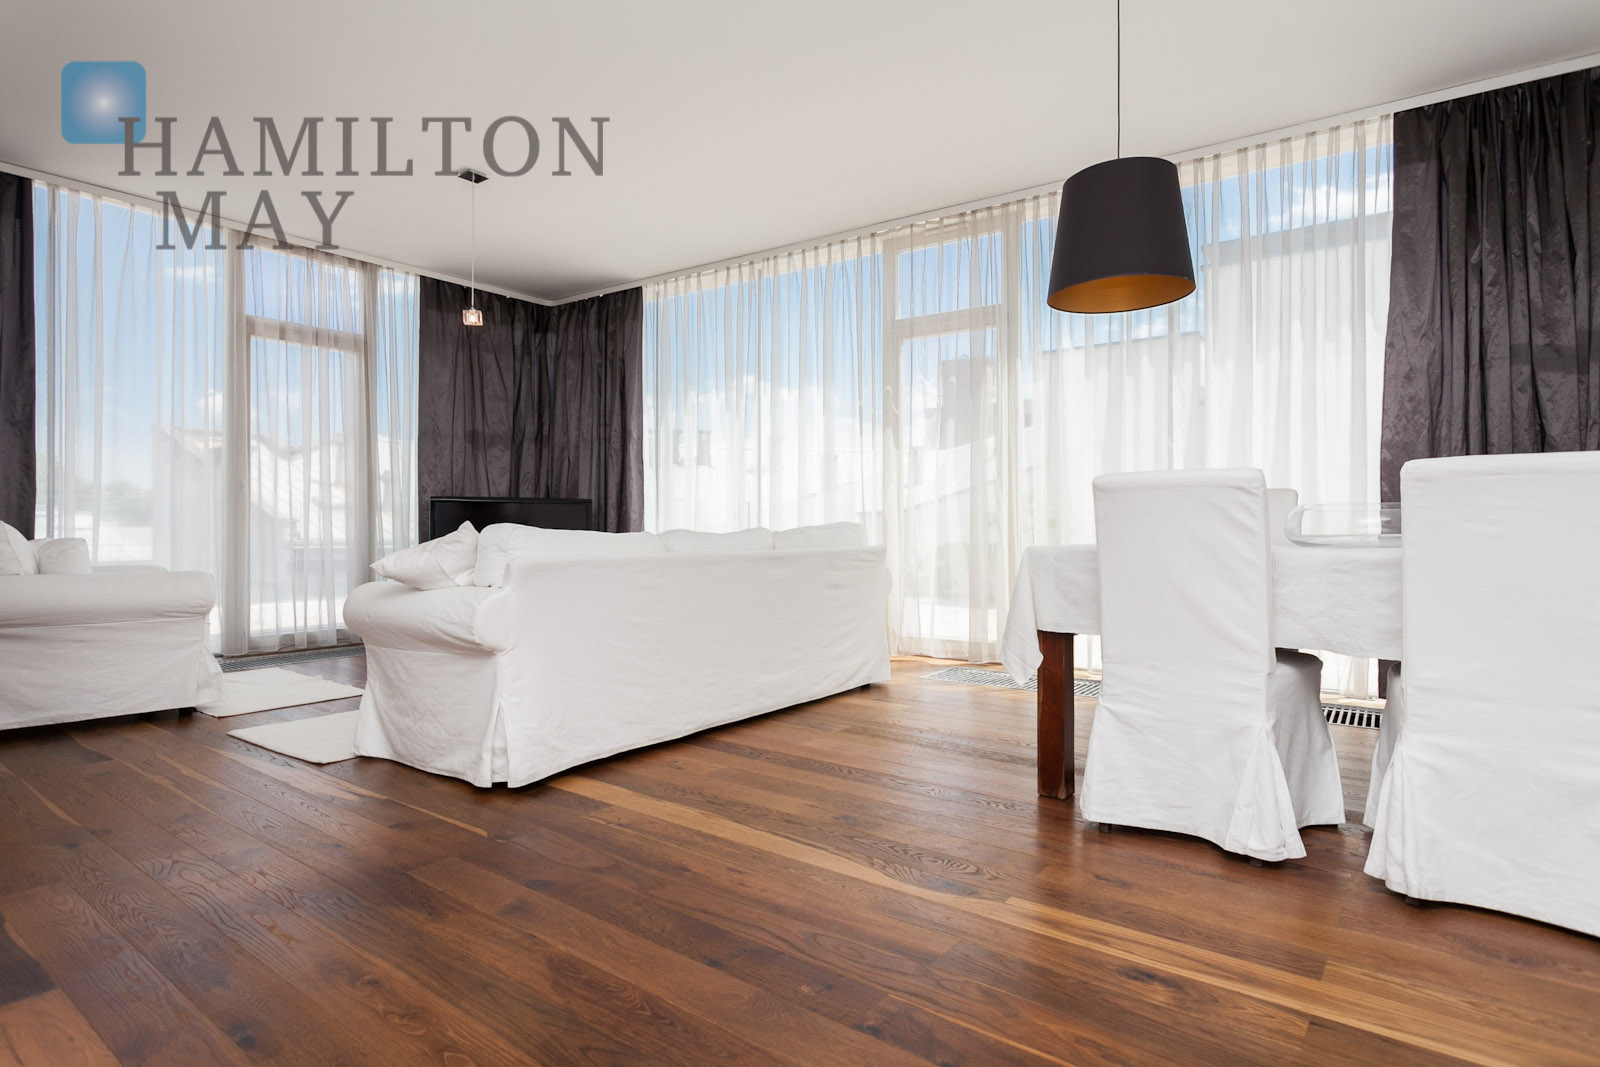 Four Bedroom Apartments for rent Krakow - Hamilton May